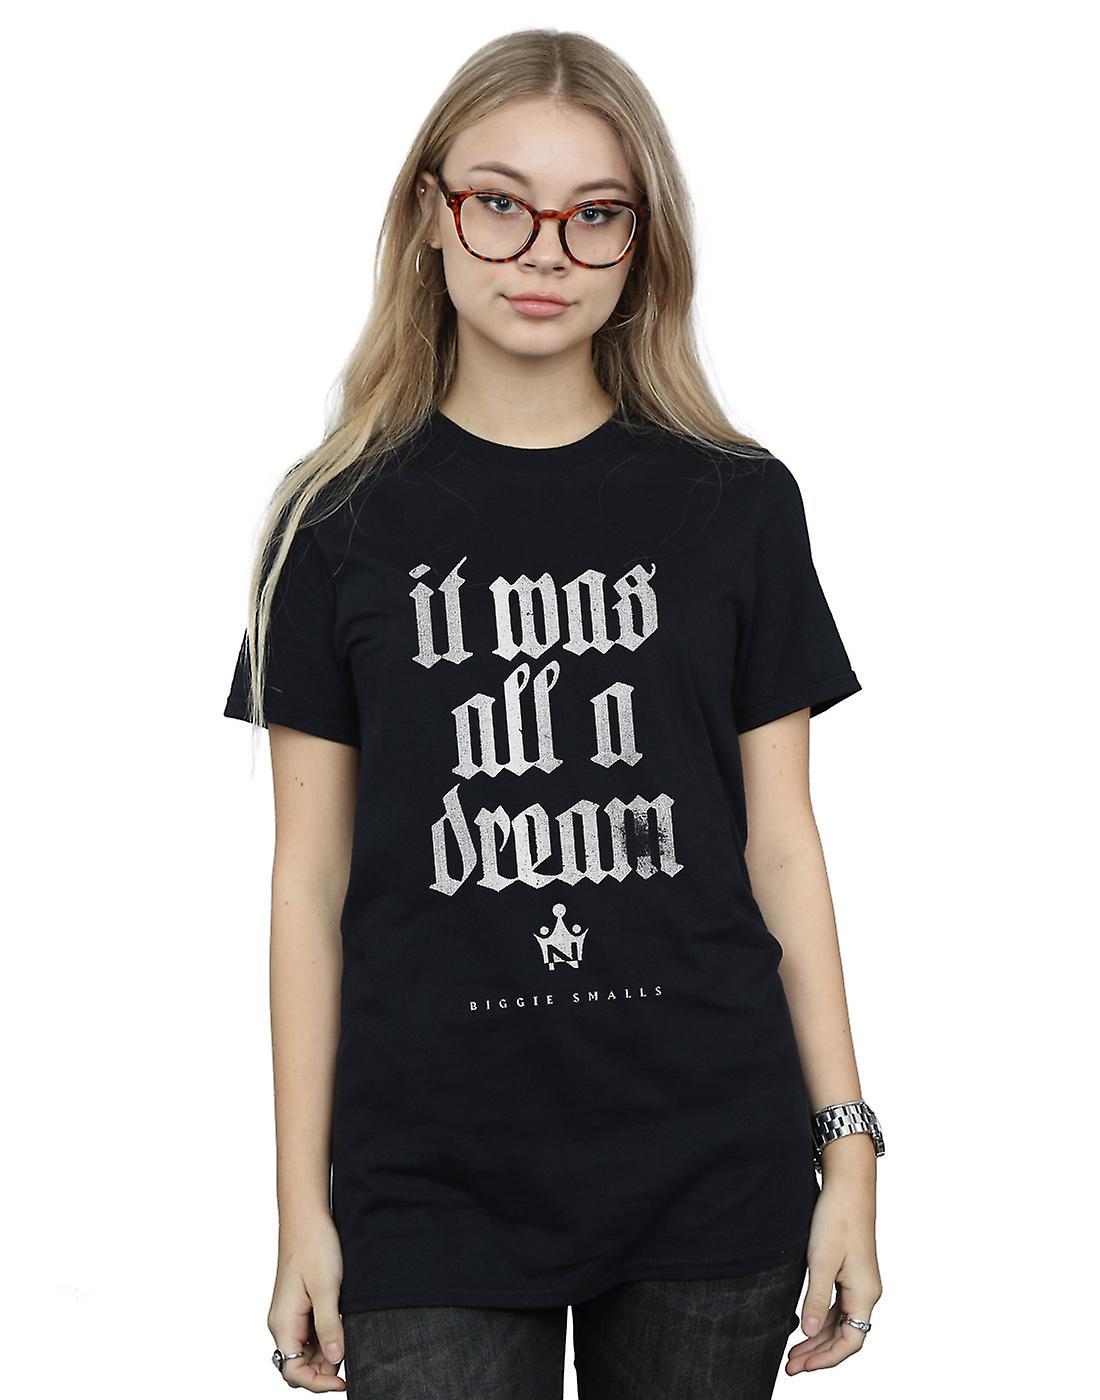 Notorious BIG Women's Dream Old English Text Boyfriend Fit T-Shirt